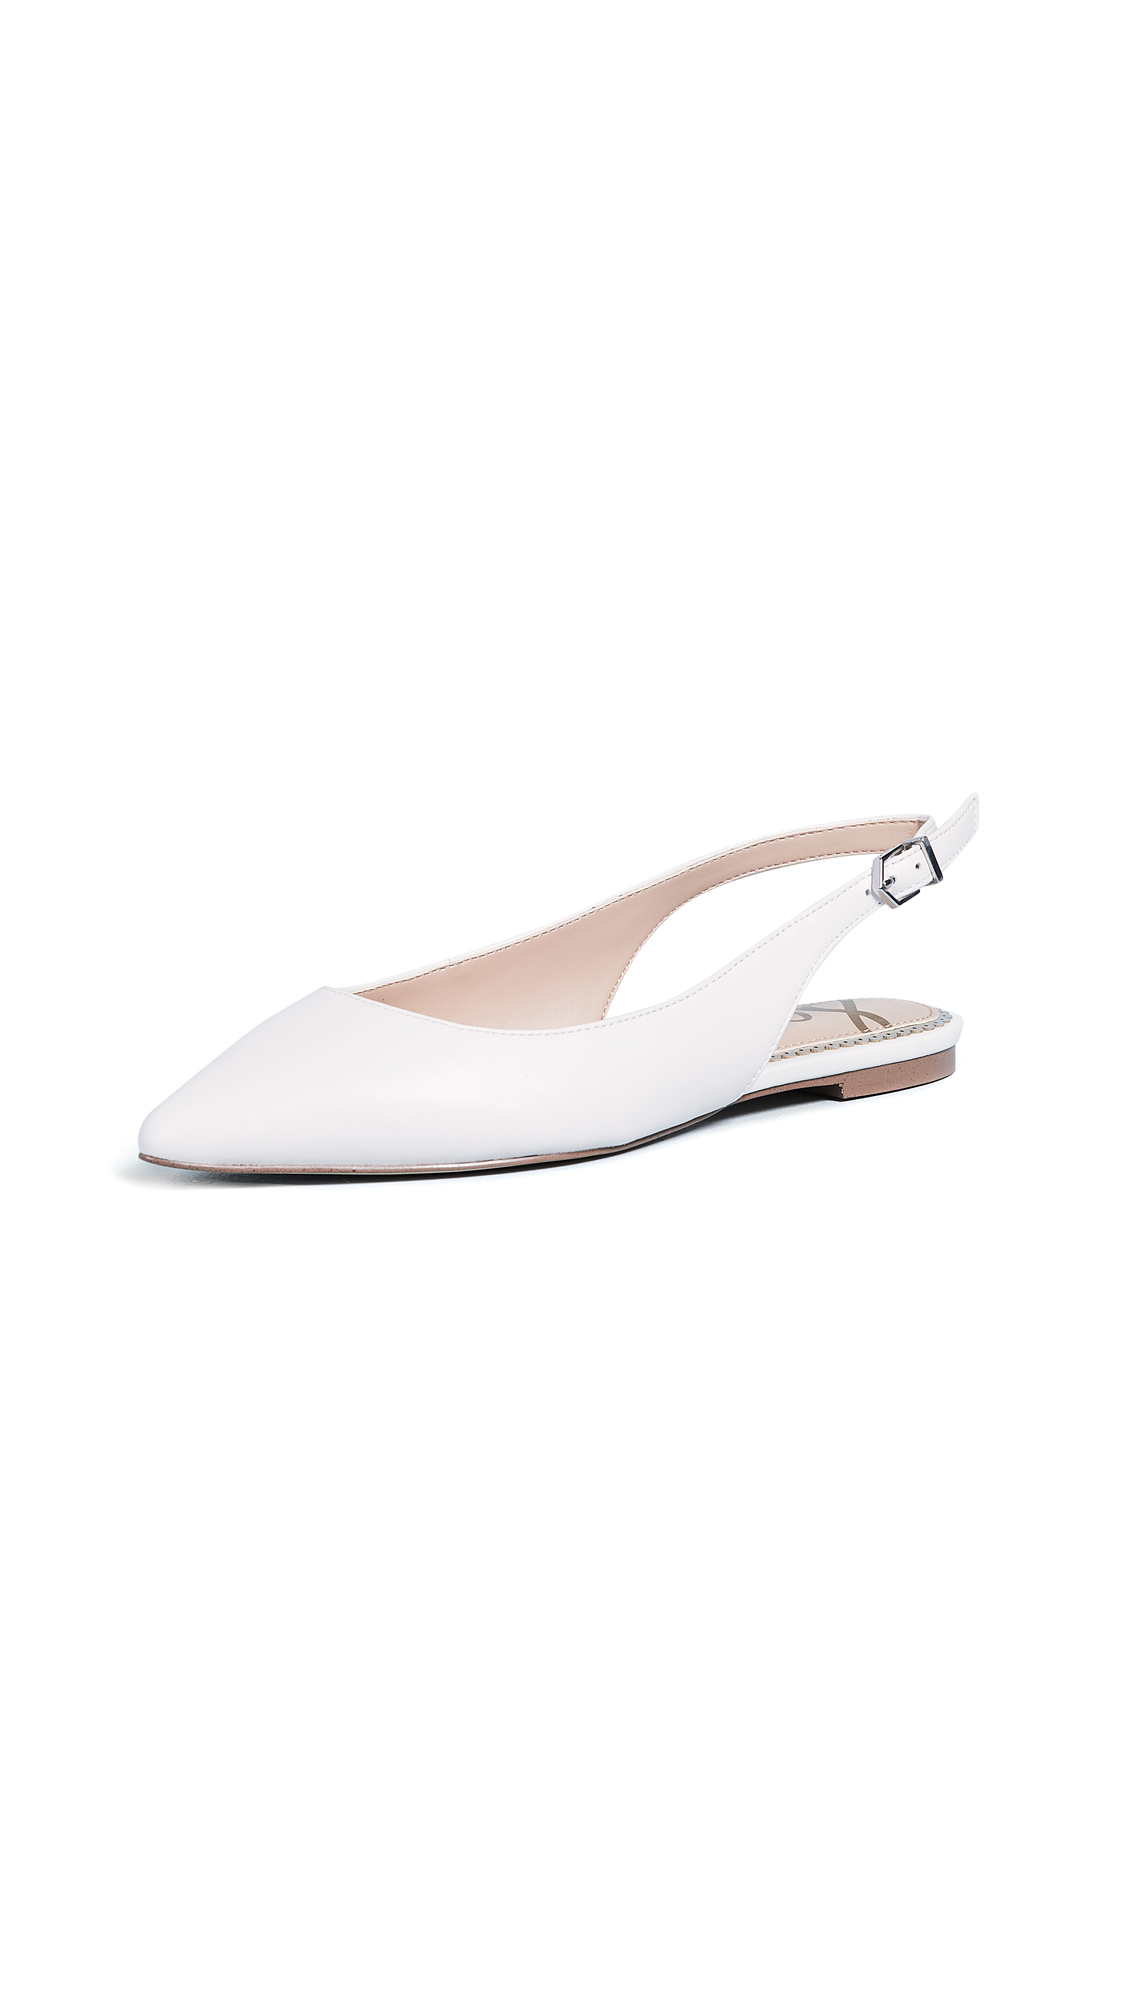 Sam Edelman Raya Slingback Flats - Bright White